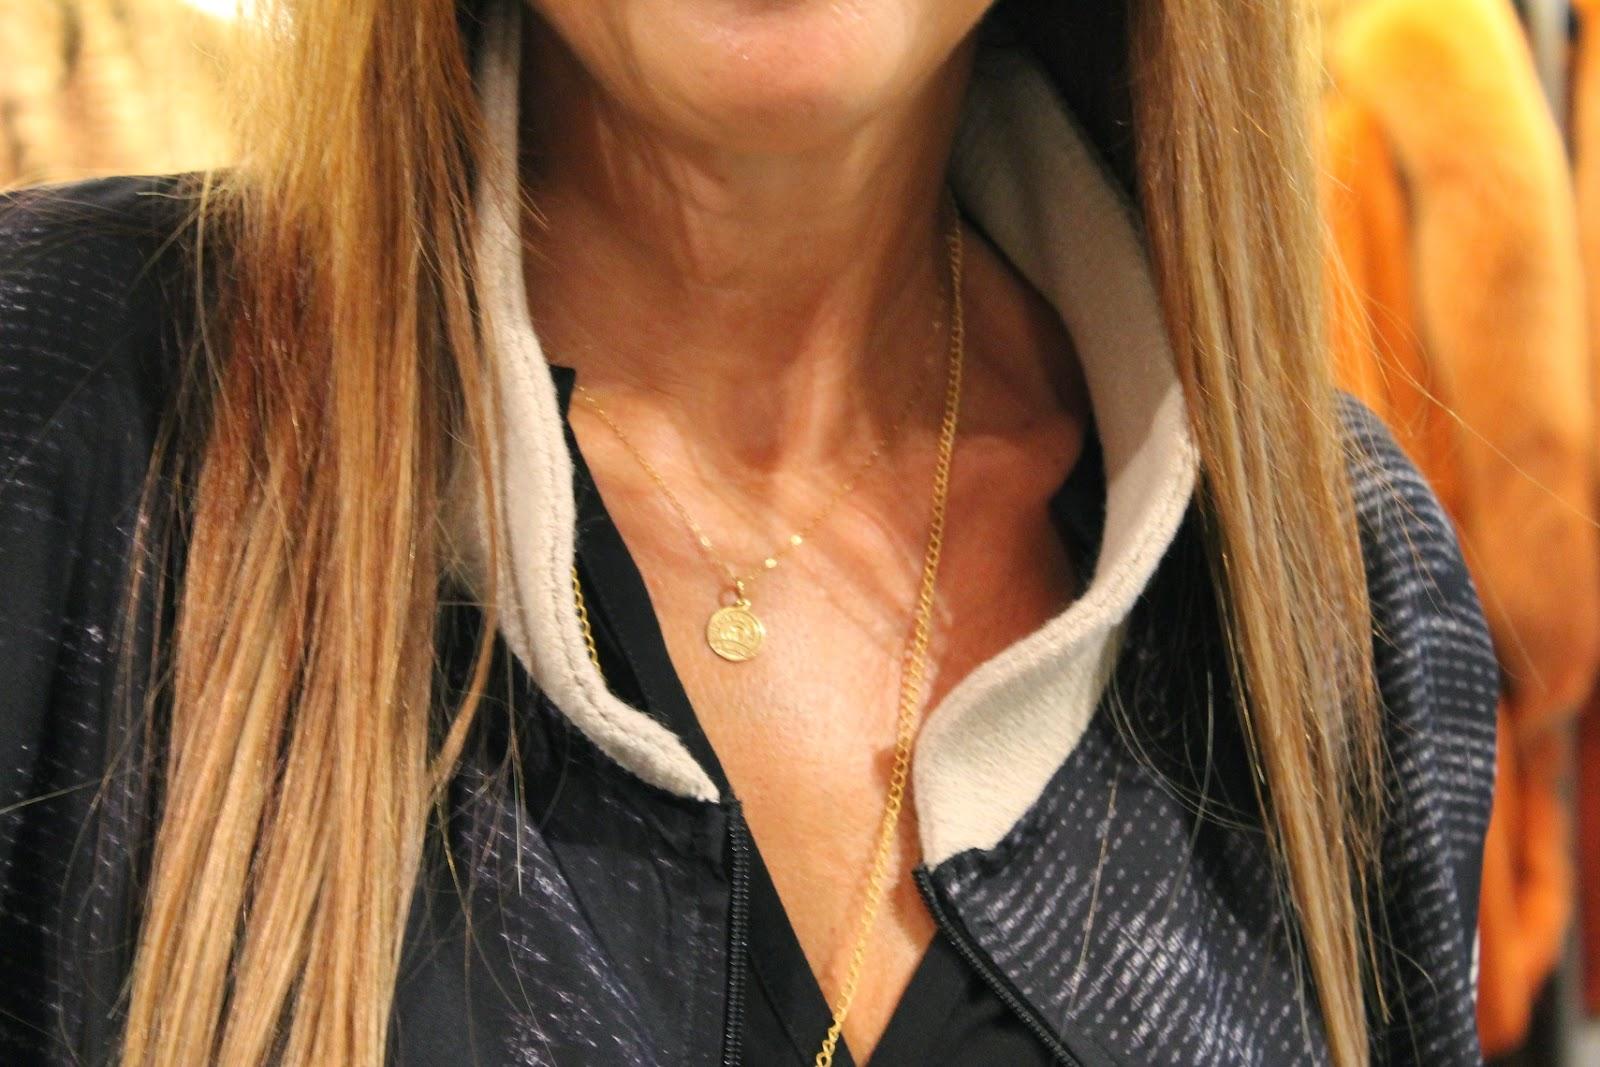 Yaëll Bartanan Benarroch, Elena Benarroch, Seda, Organza, diseño, colección, Fashion style, Street Style, Leather, Carmen Hummer